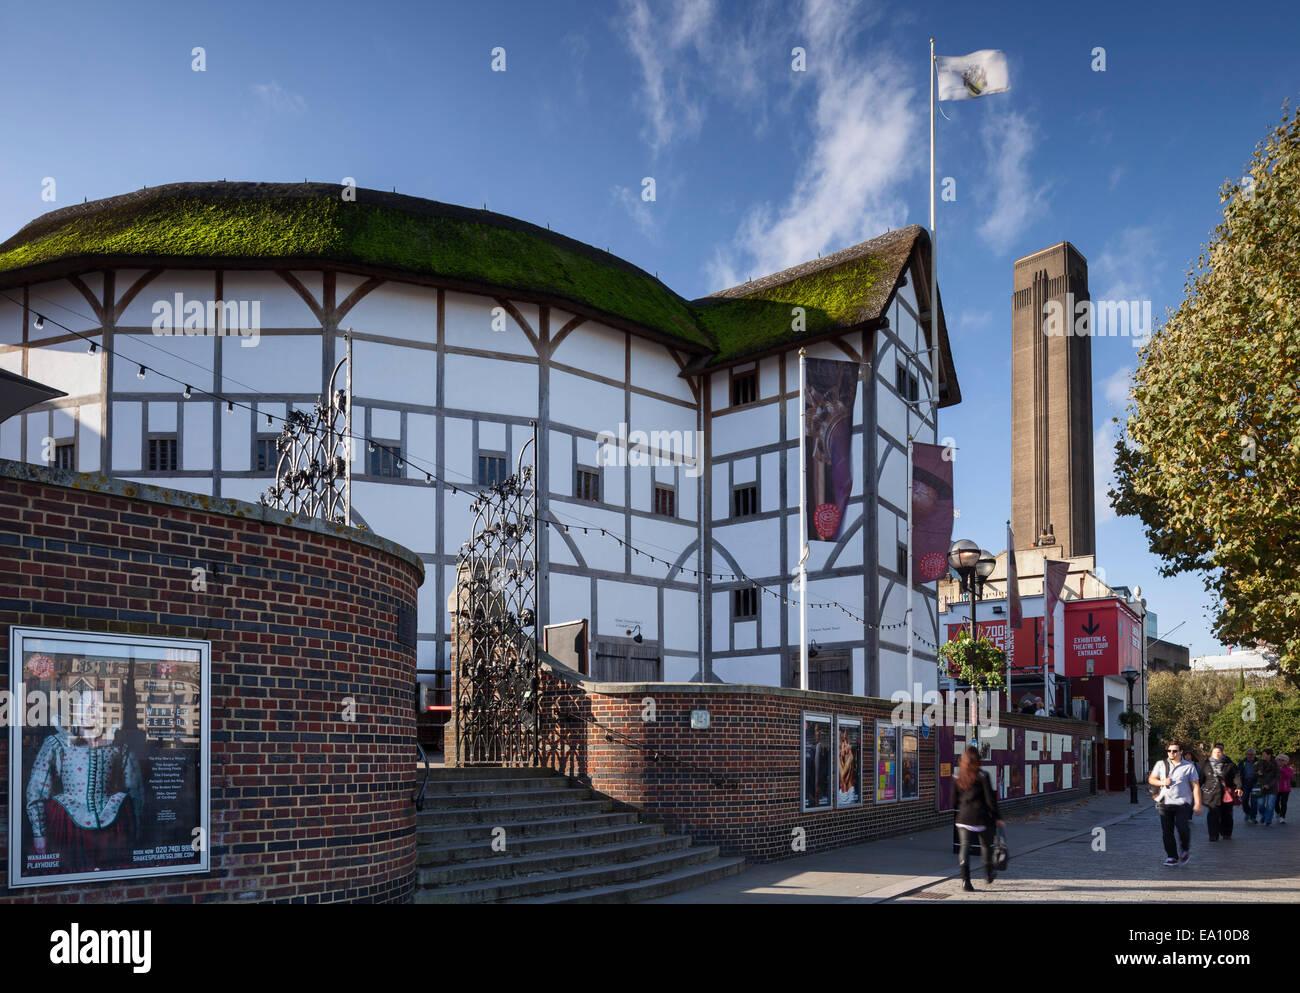 The Globe Theatre, Bankside, Southwark, London, England, UK - Stock Image